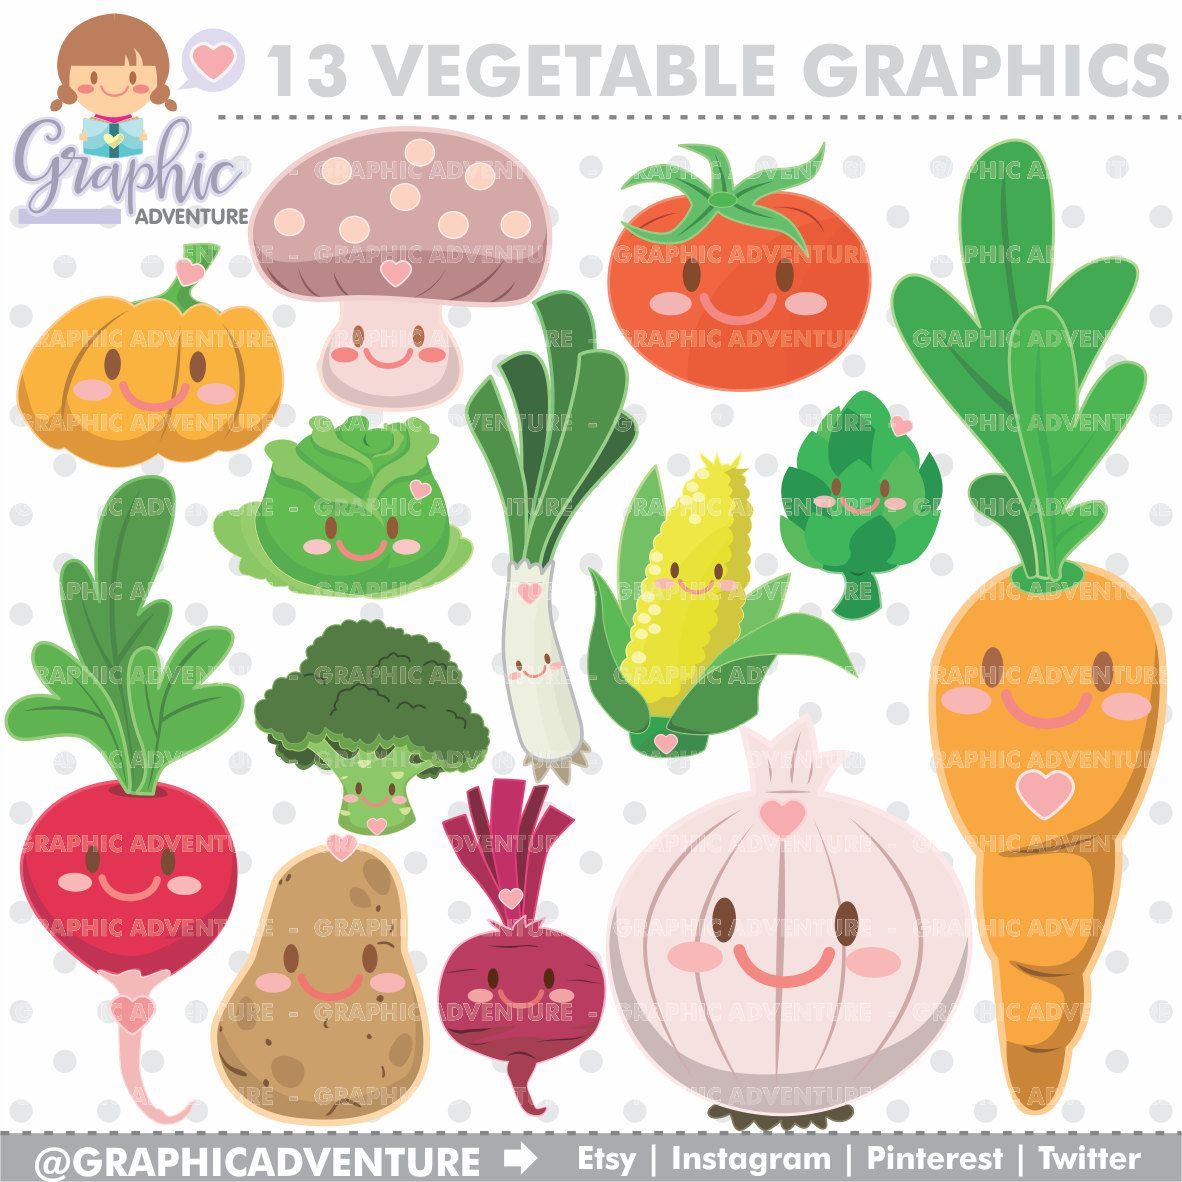 Cartoon clipart vegetable. Graphics commercial use kawaii